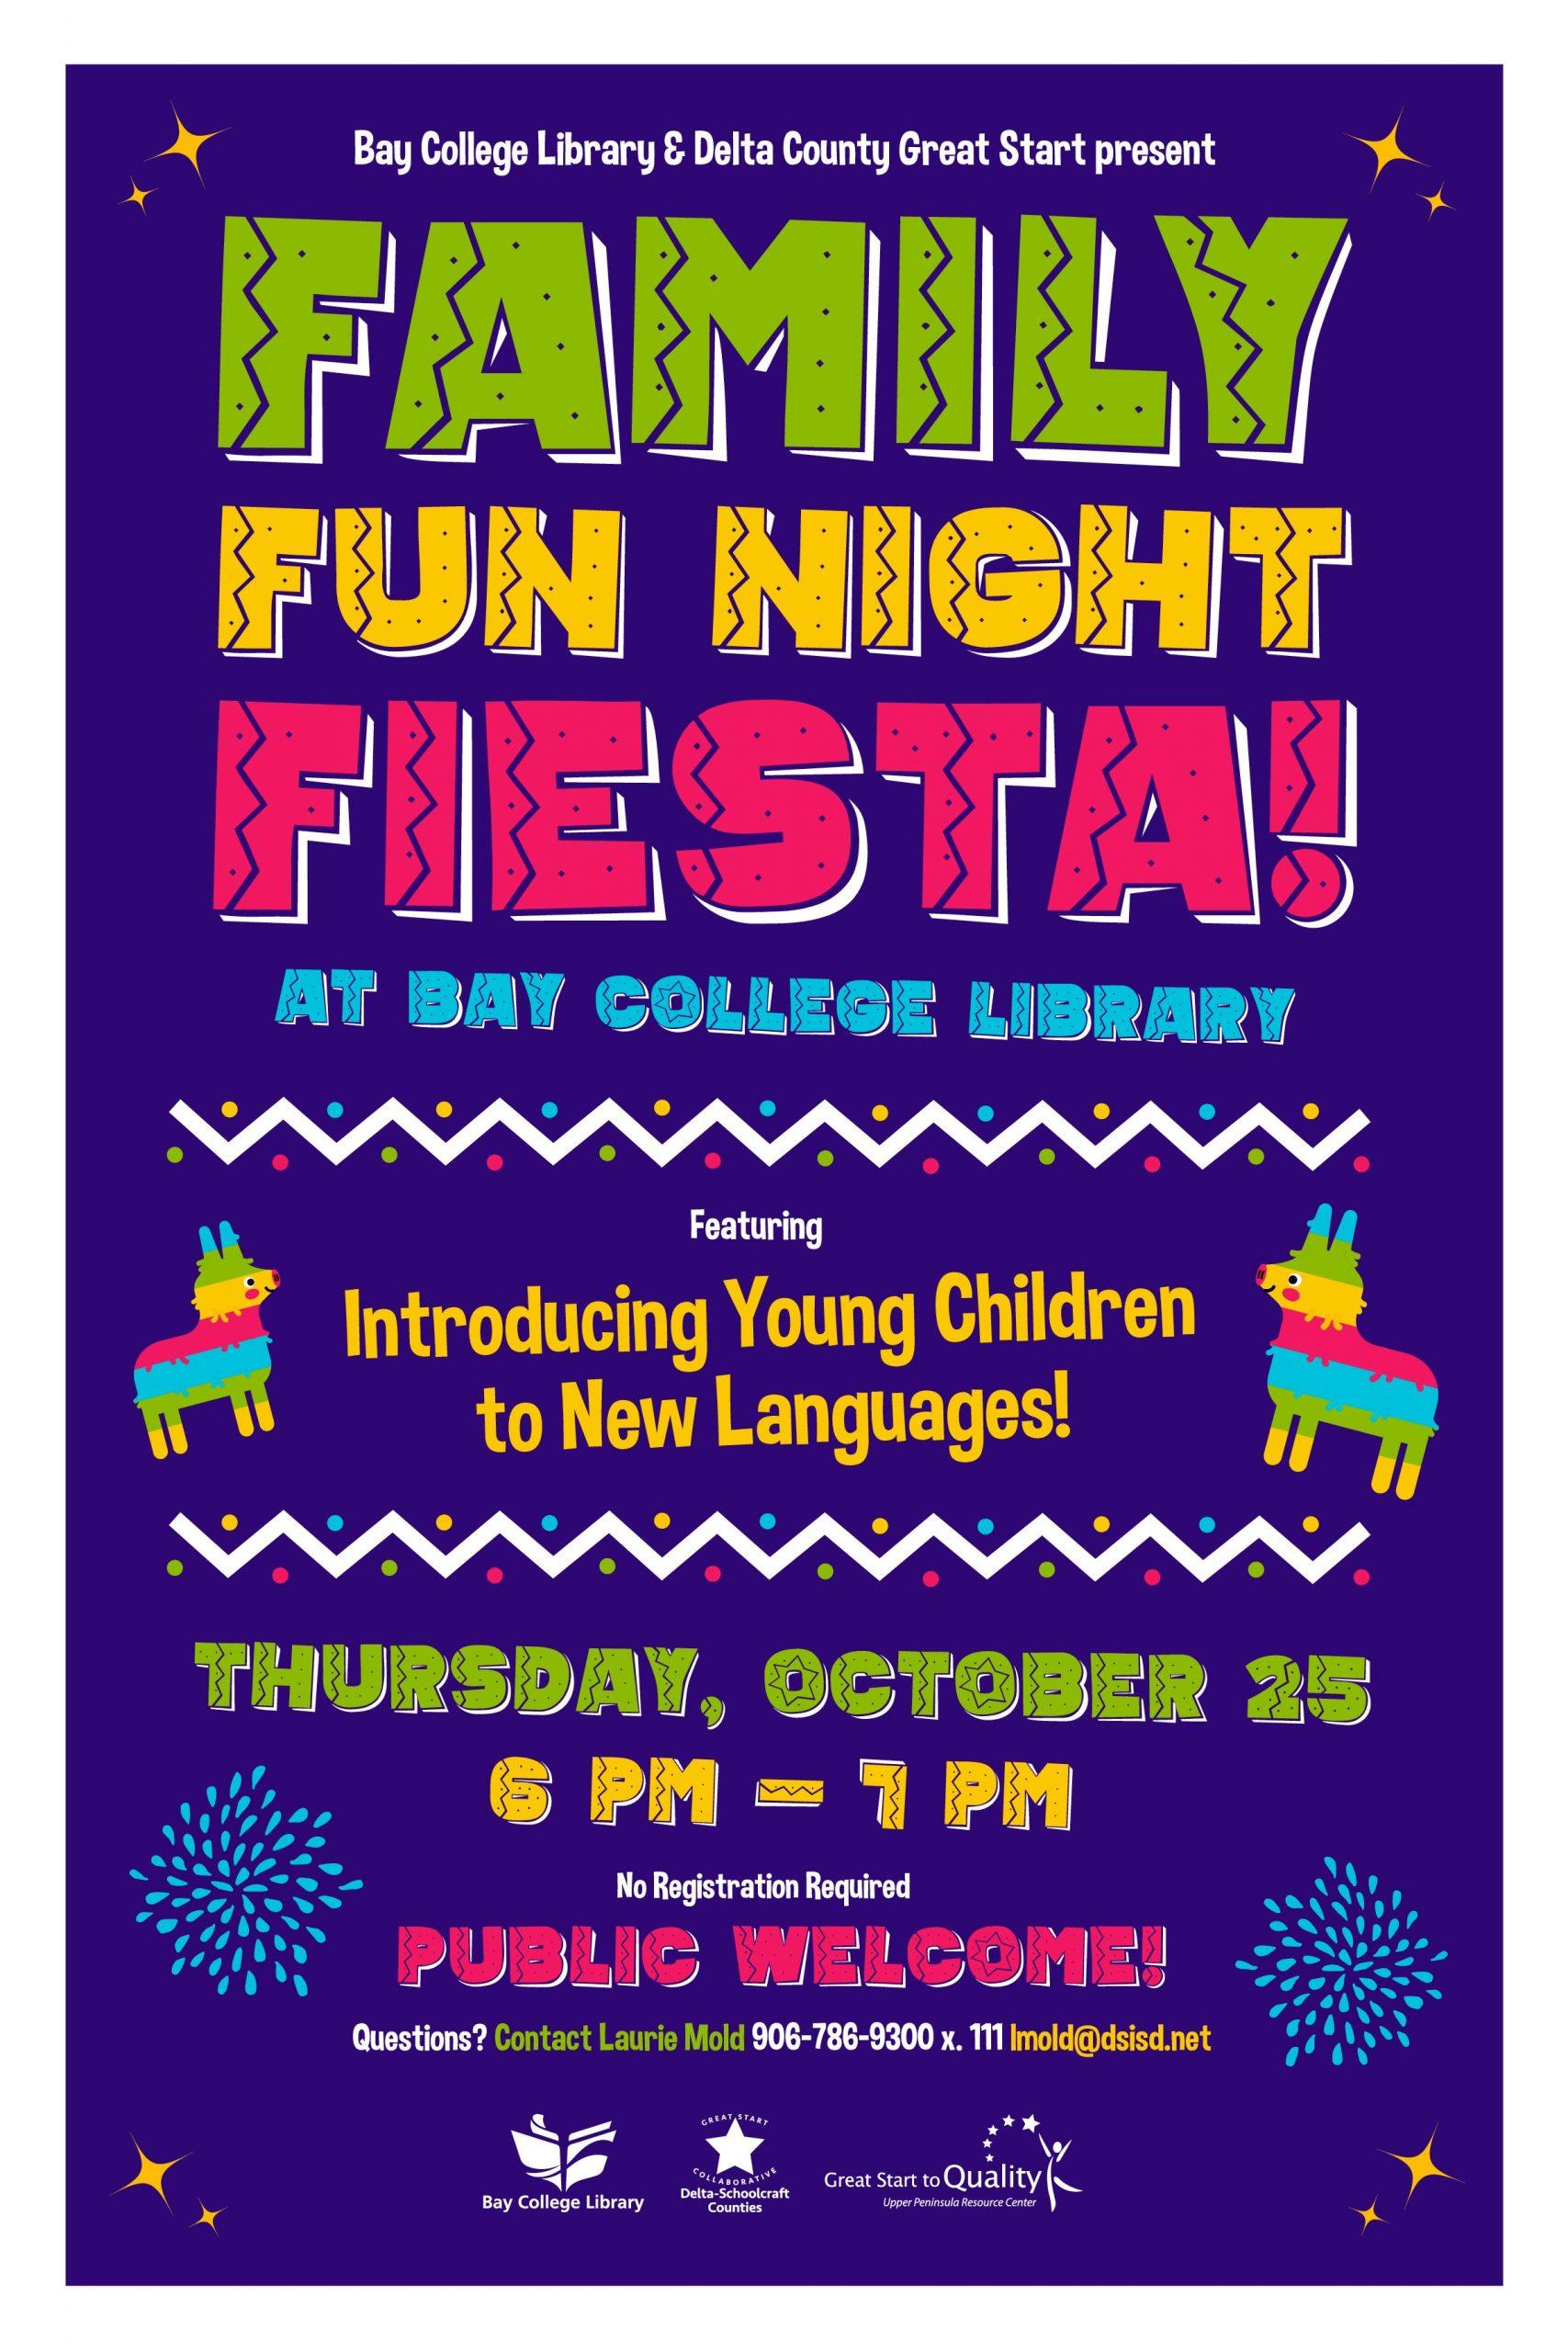 Bay College Family Fun Night Set Next Thursday